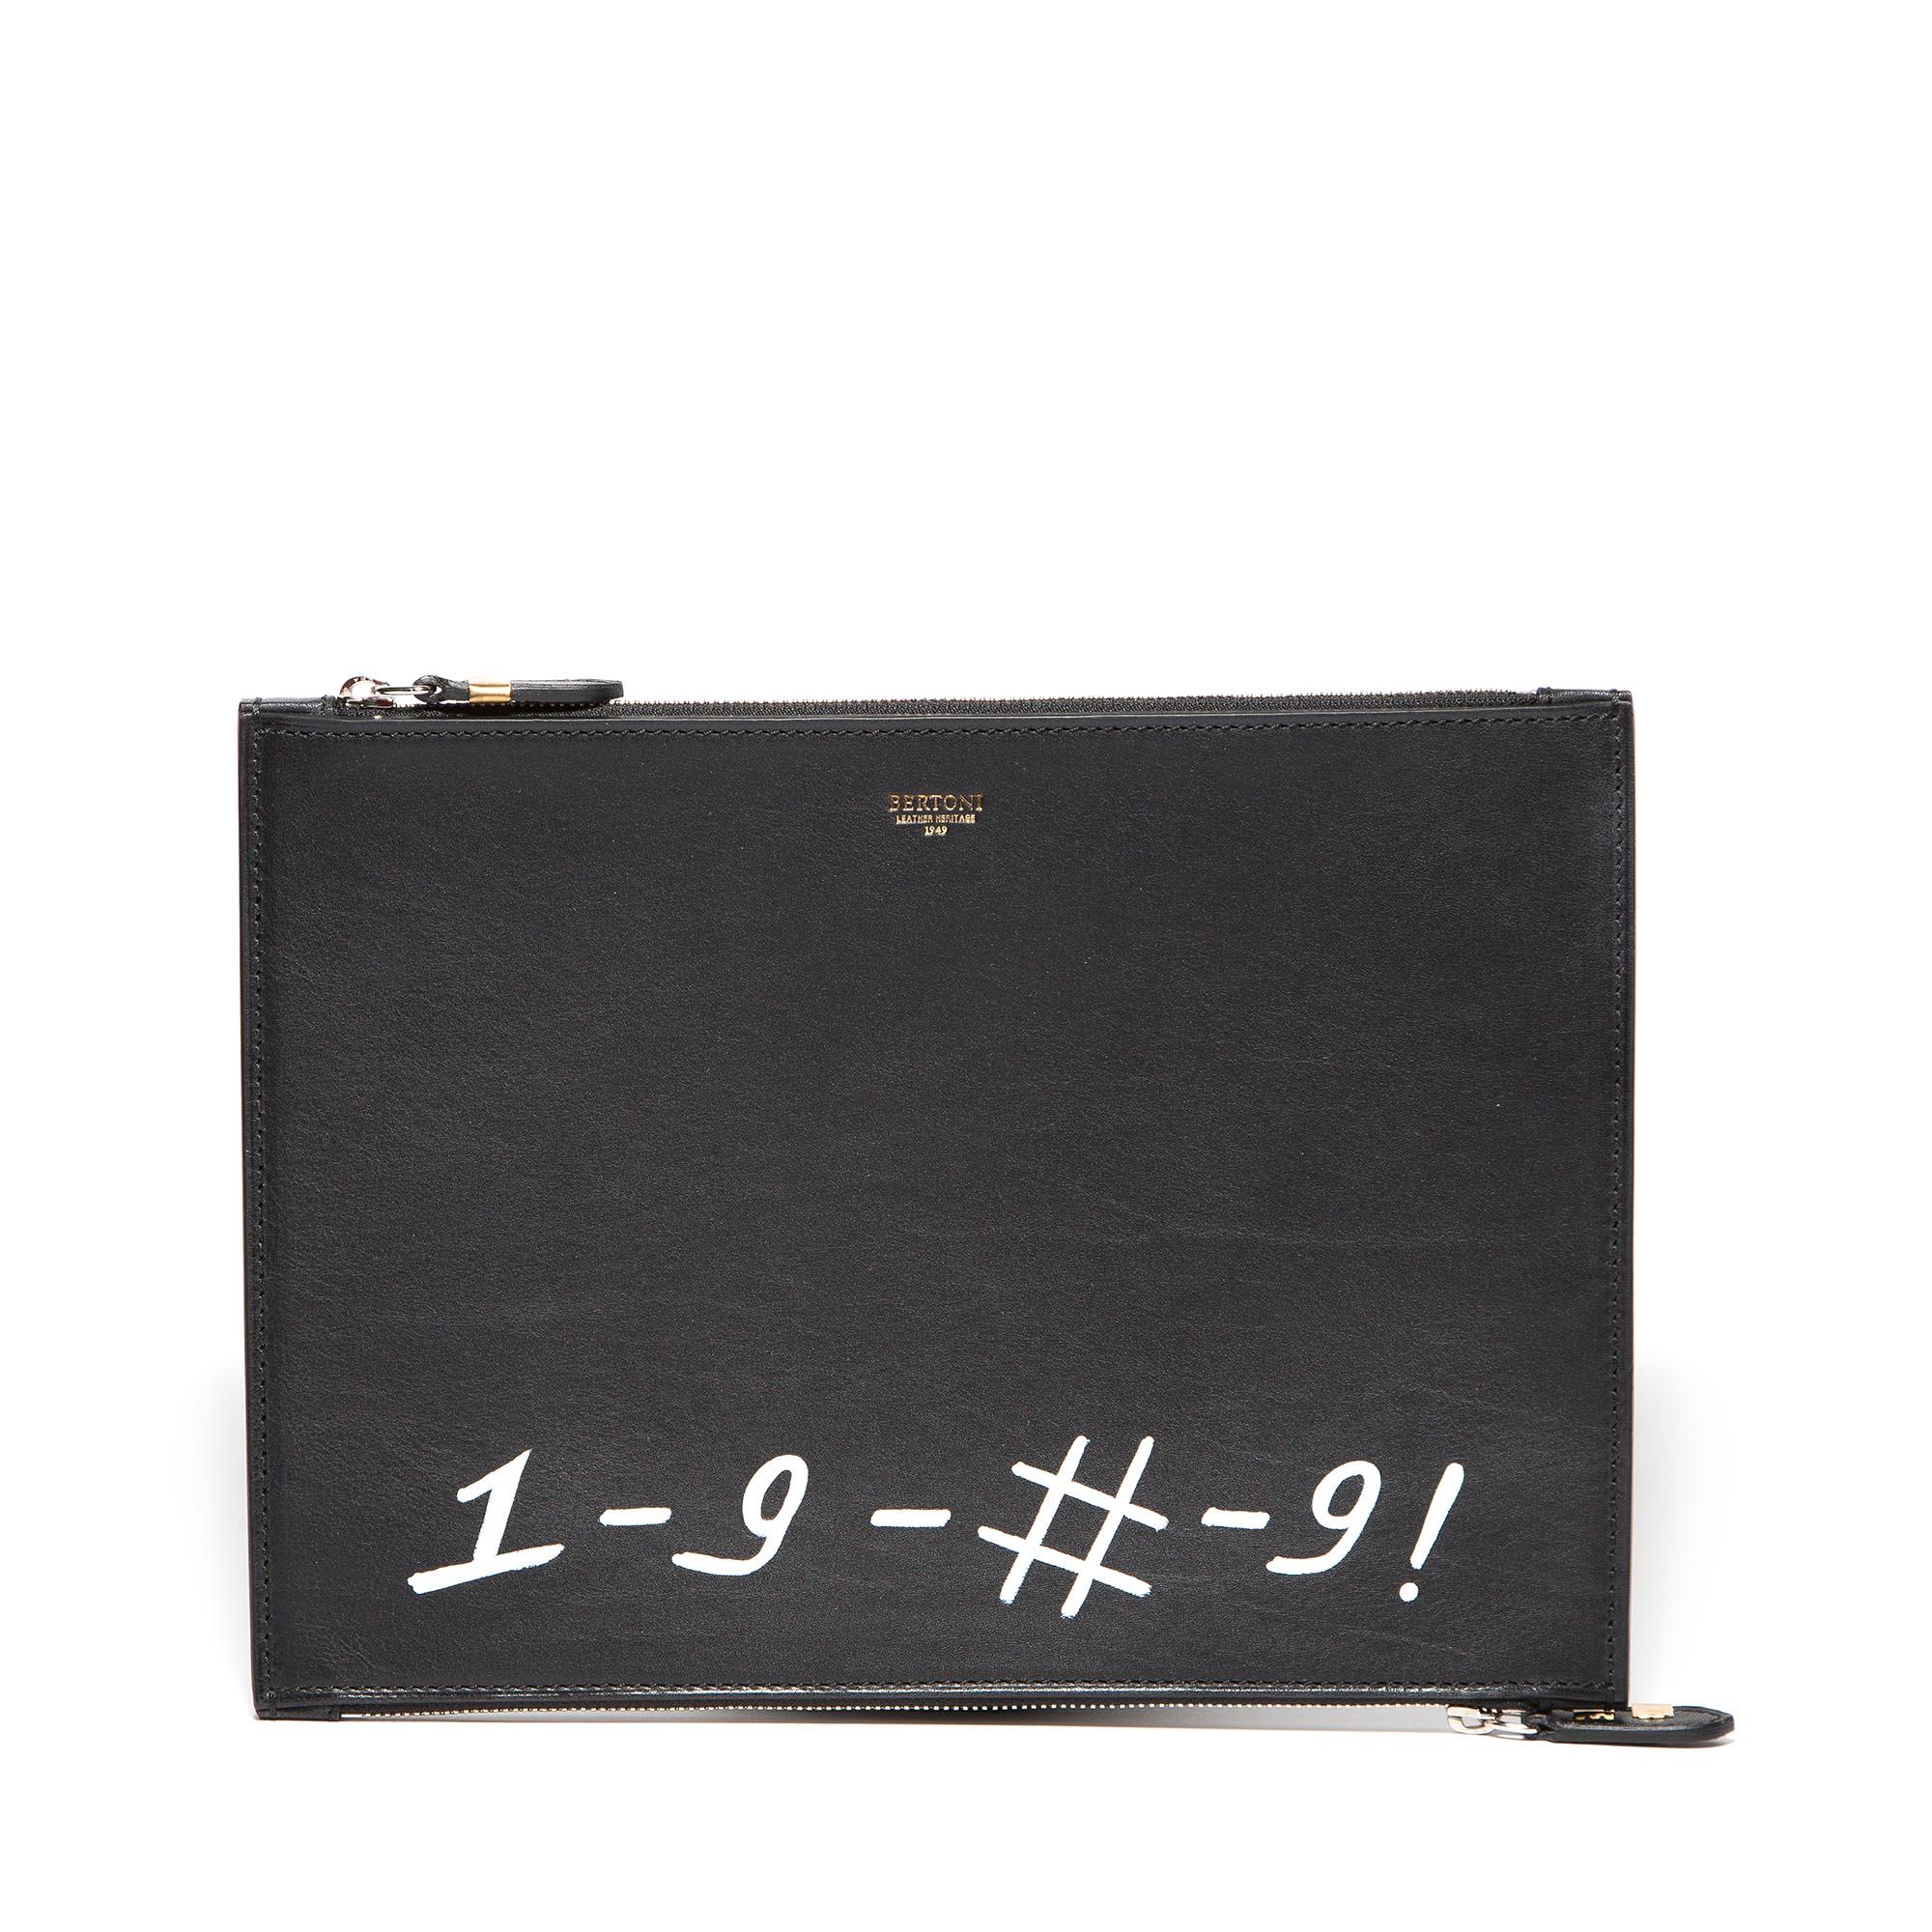 Double-Zipped-Pouch-black-rock-calf-bag-Bertoni-1949